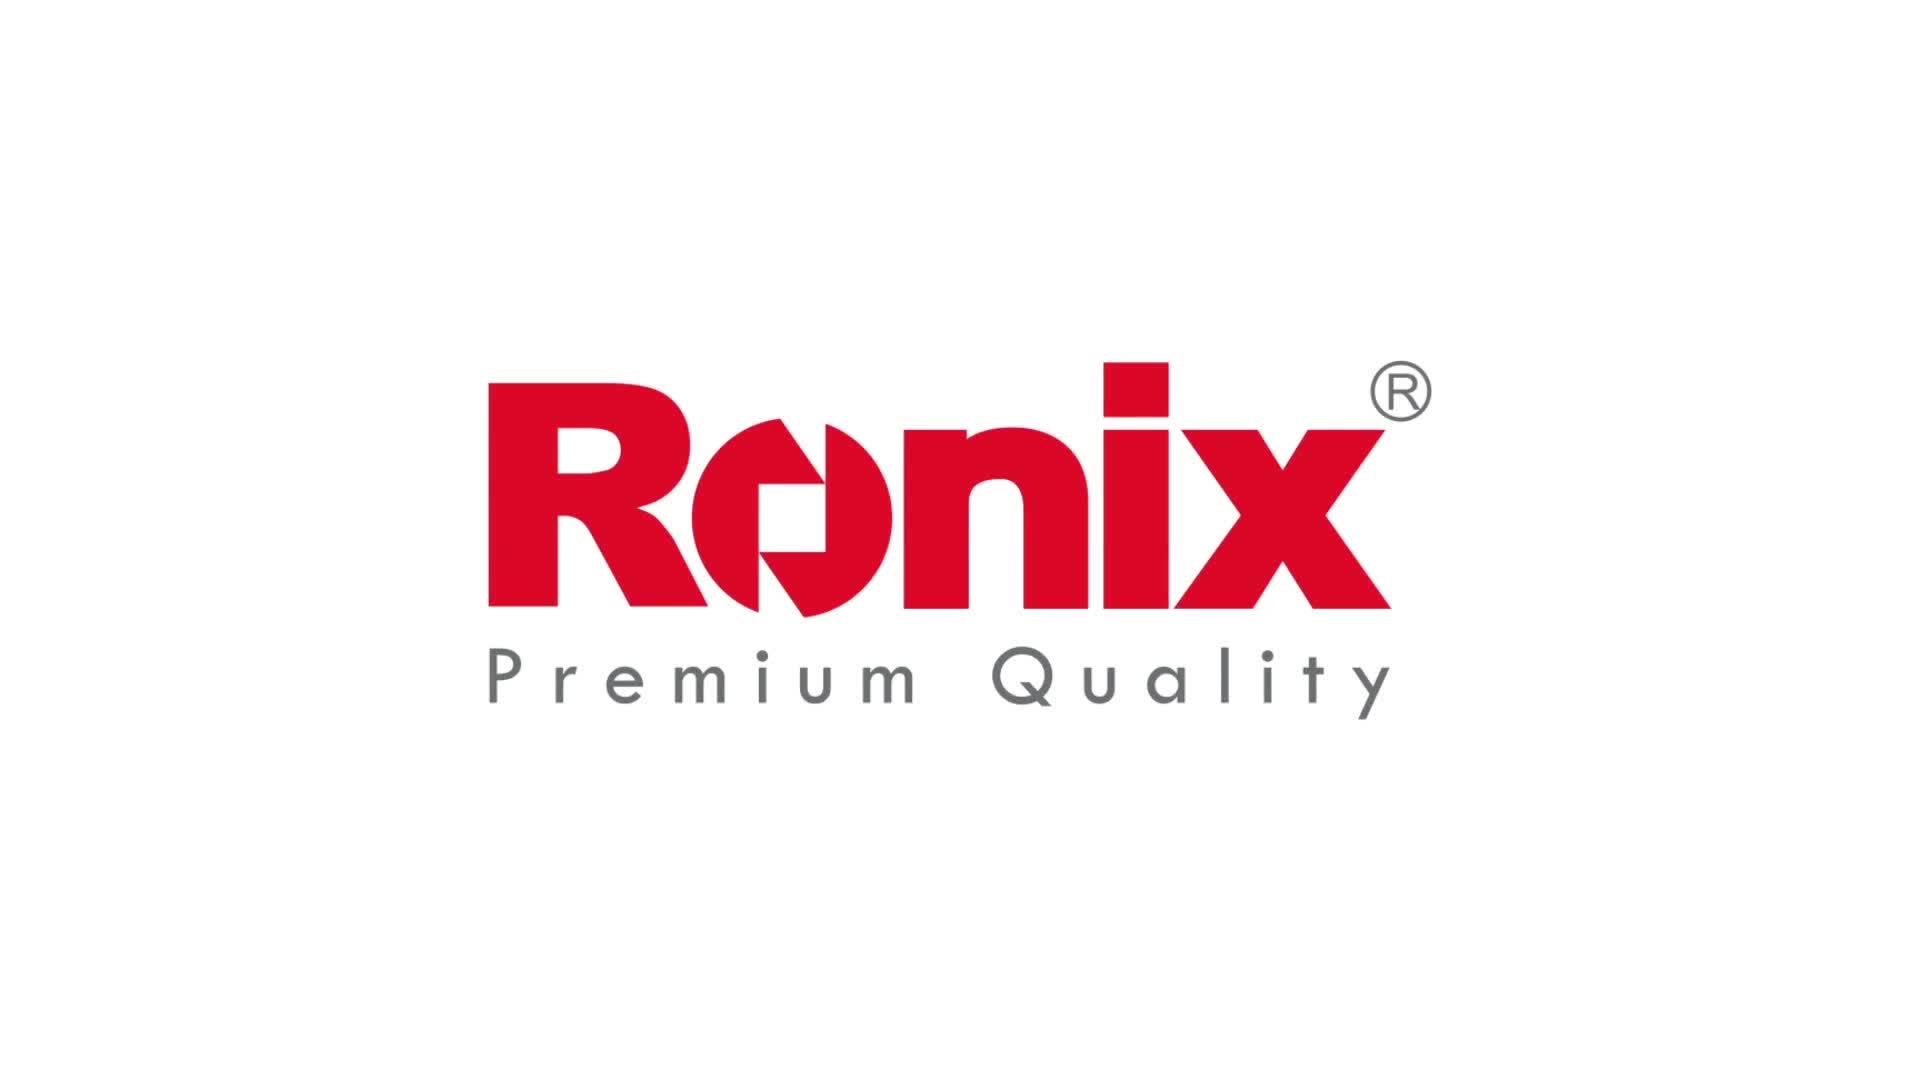 RONIX EL PENCERESİ RH-1601 OPTIMA RH-1602 SÜPER RH-1603 CROM